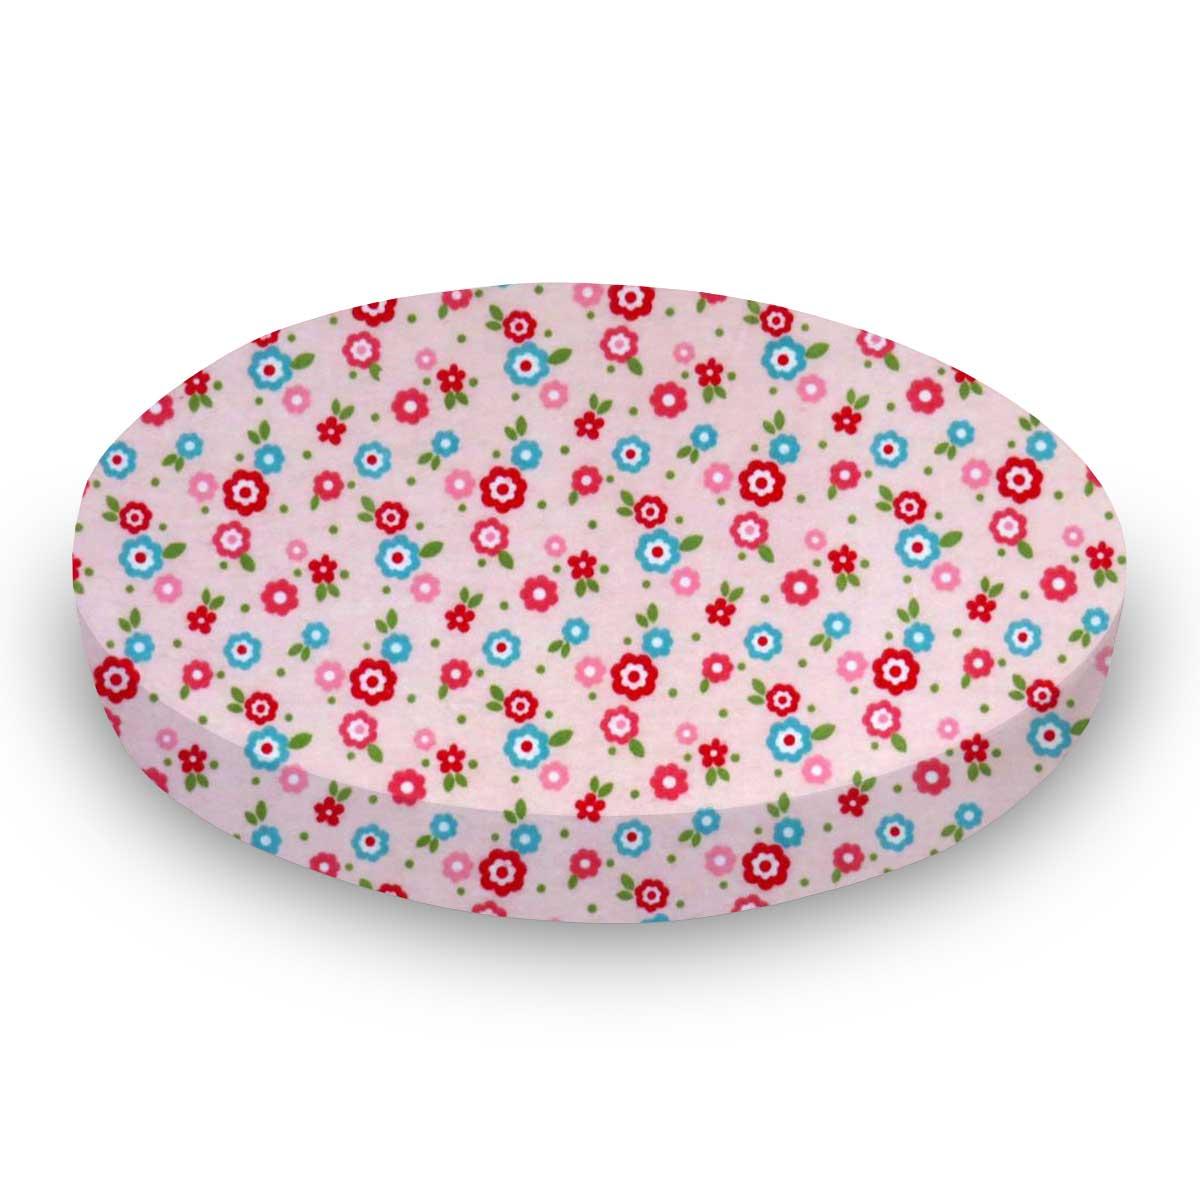 Oval Crib Sheets Stokke Oval Crib Sheets 100 Cotton